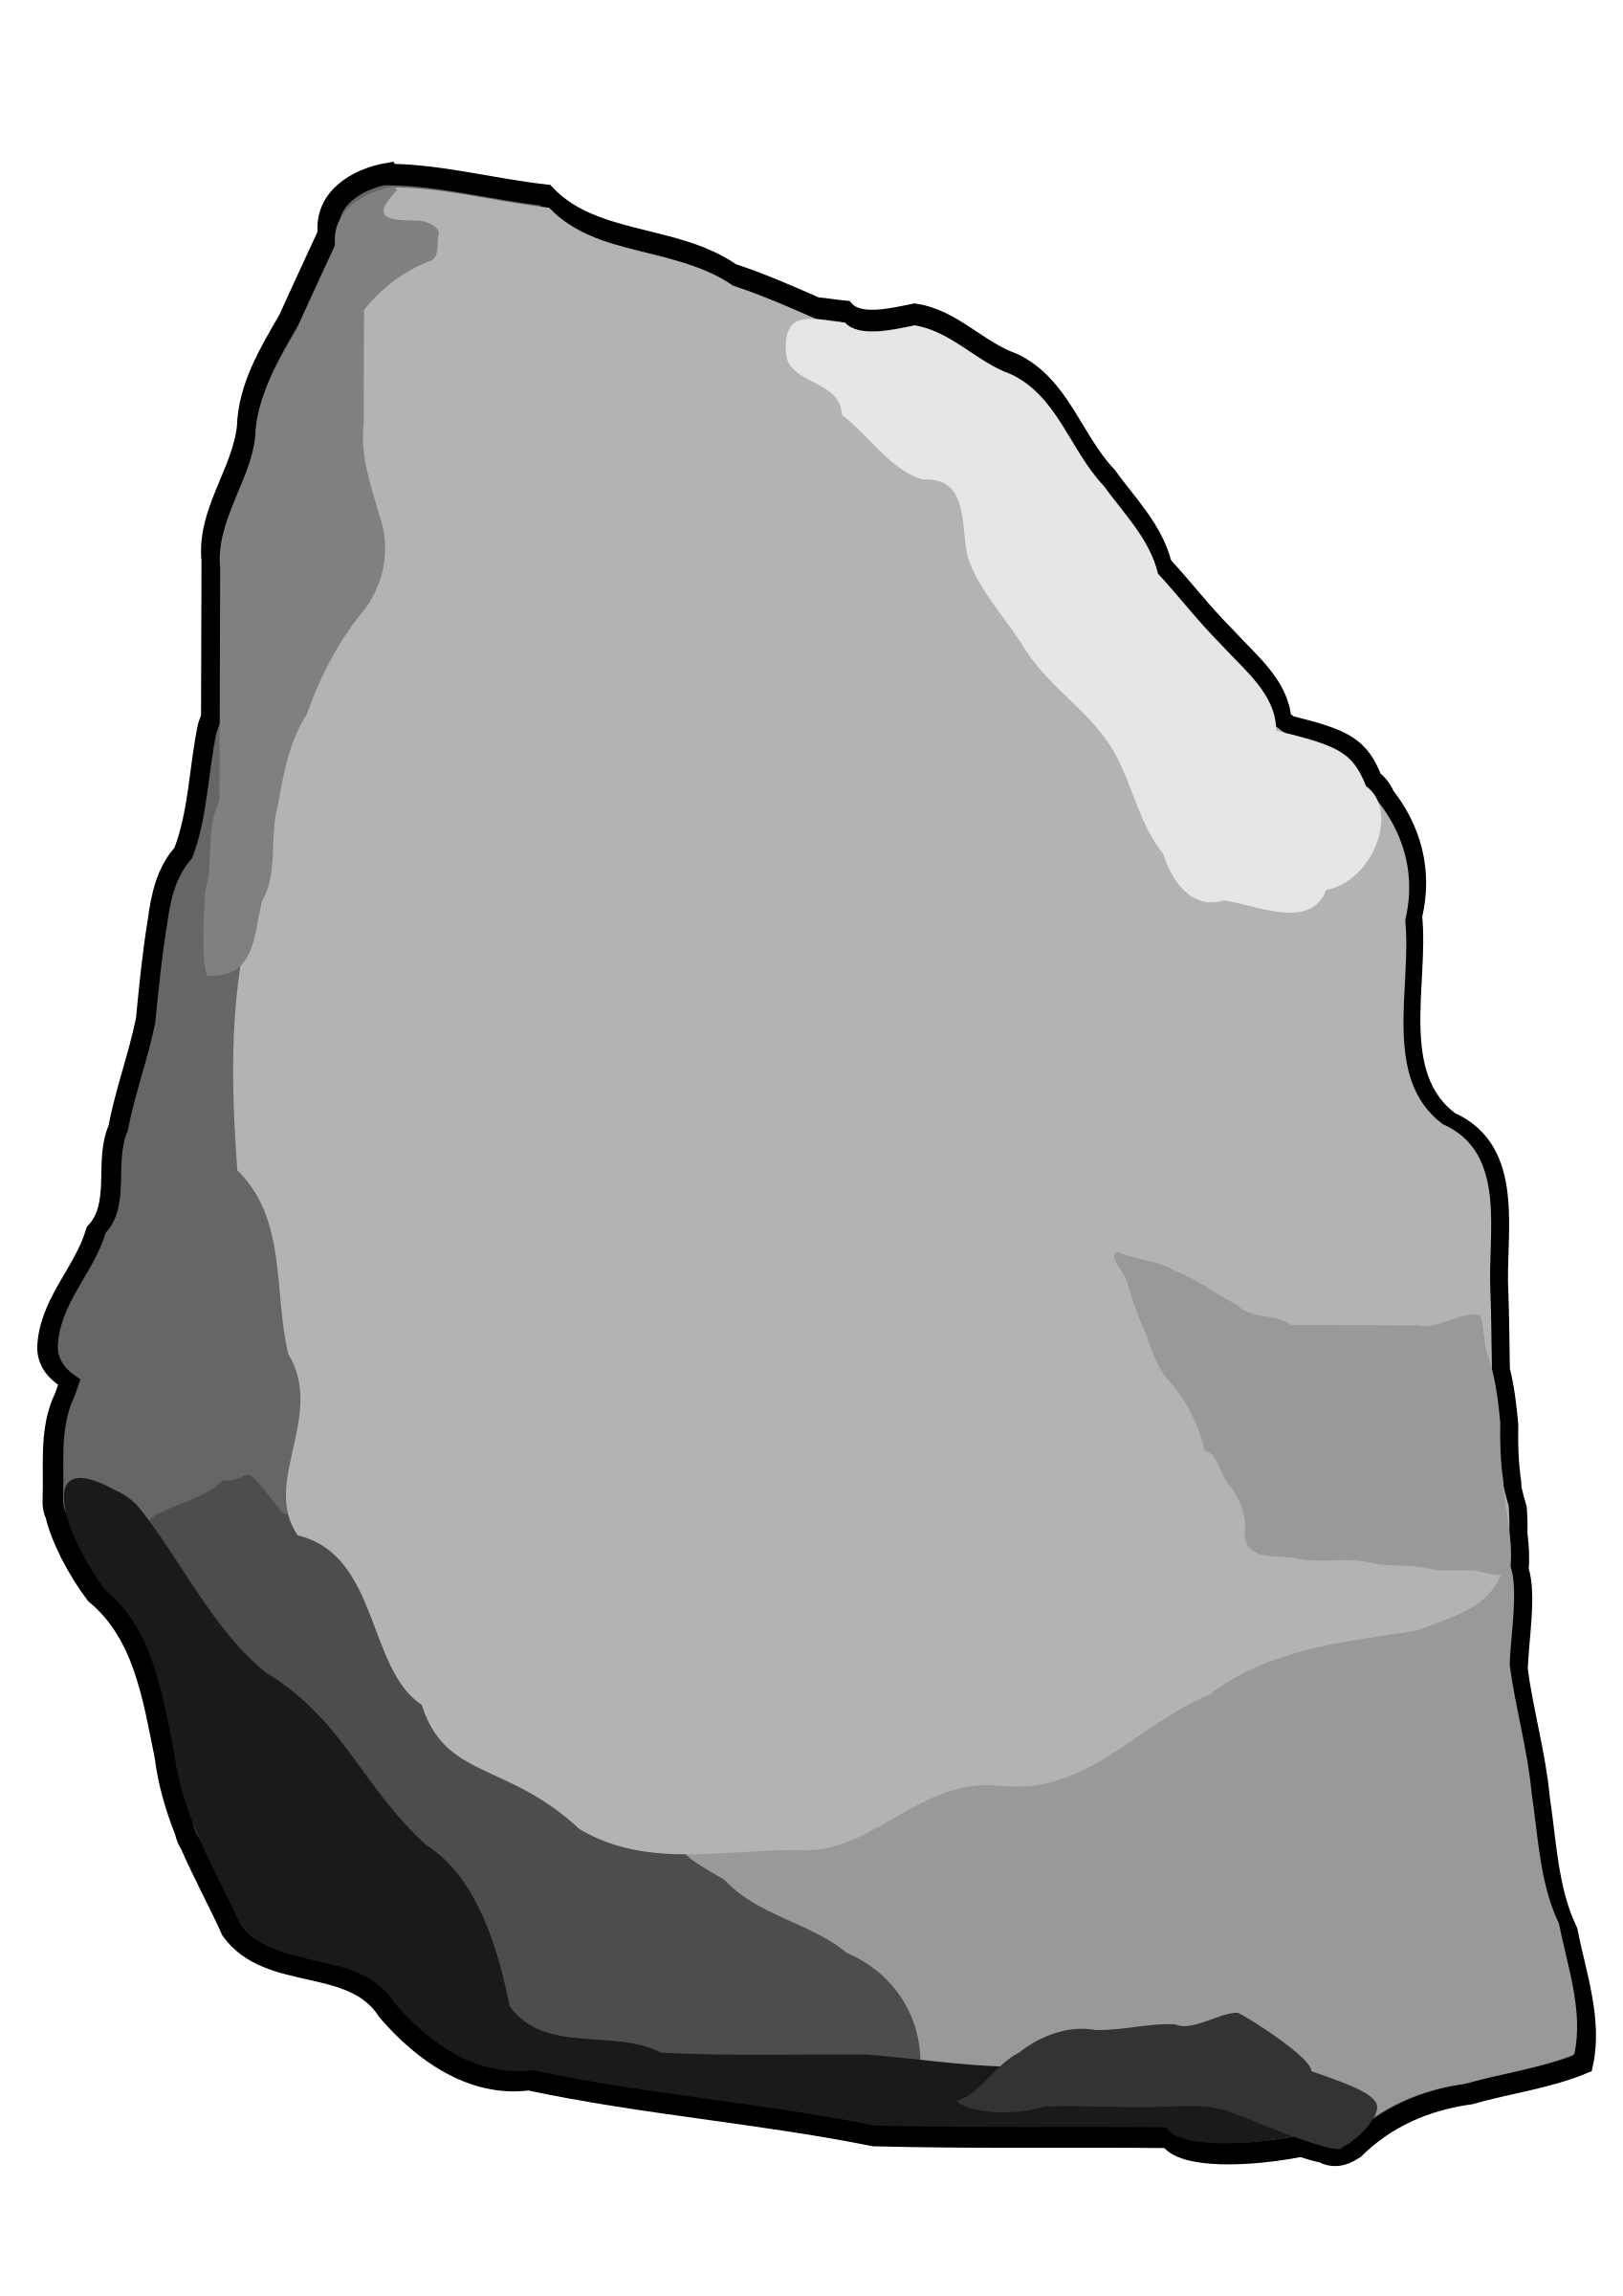 grey stone rock vector clipart image free stock photo public rh goodfreephotos com free vector rocks Rock Guitar Vector